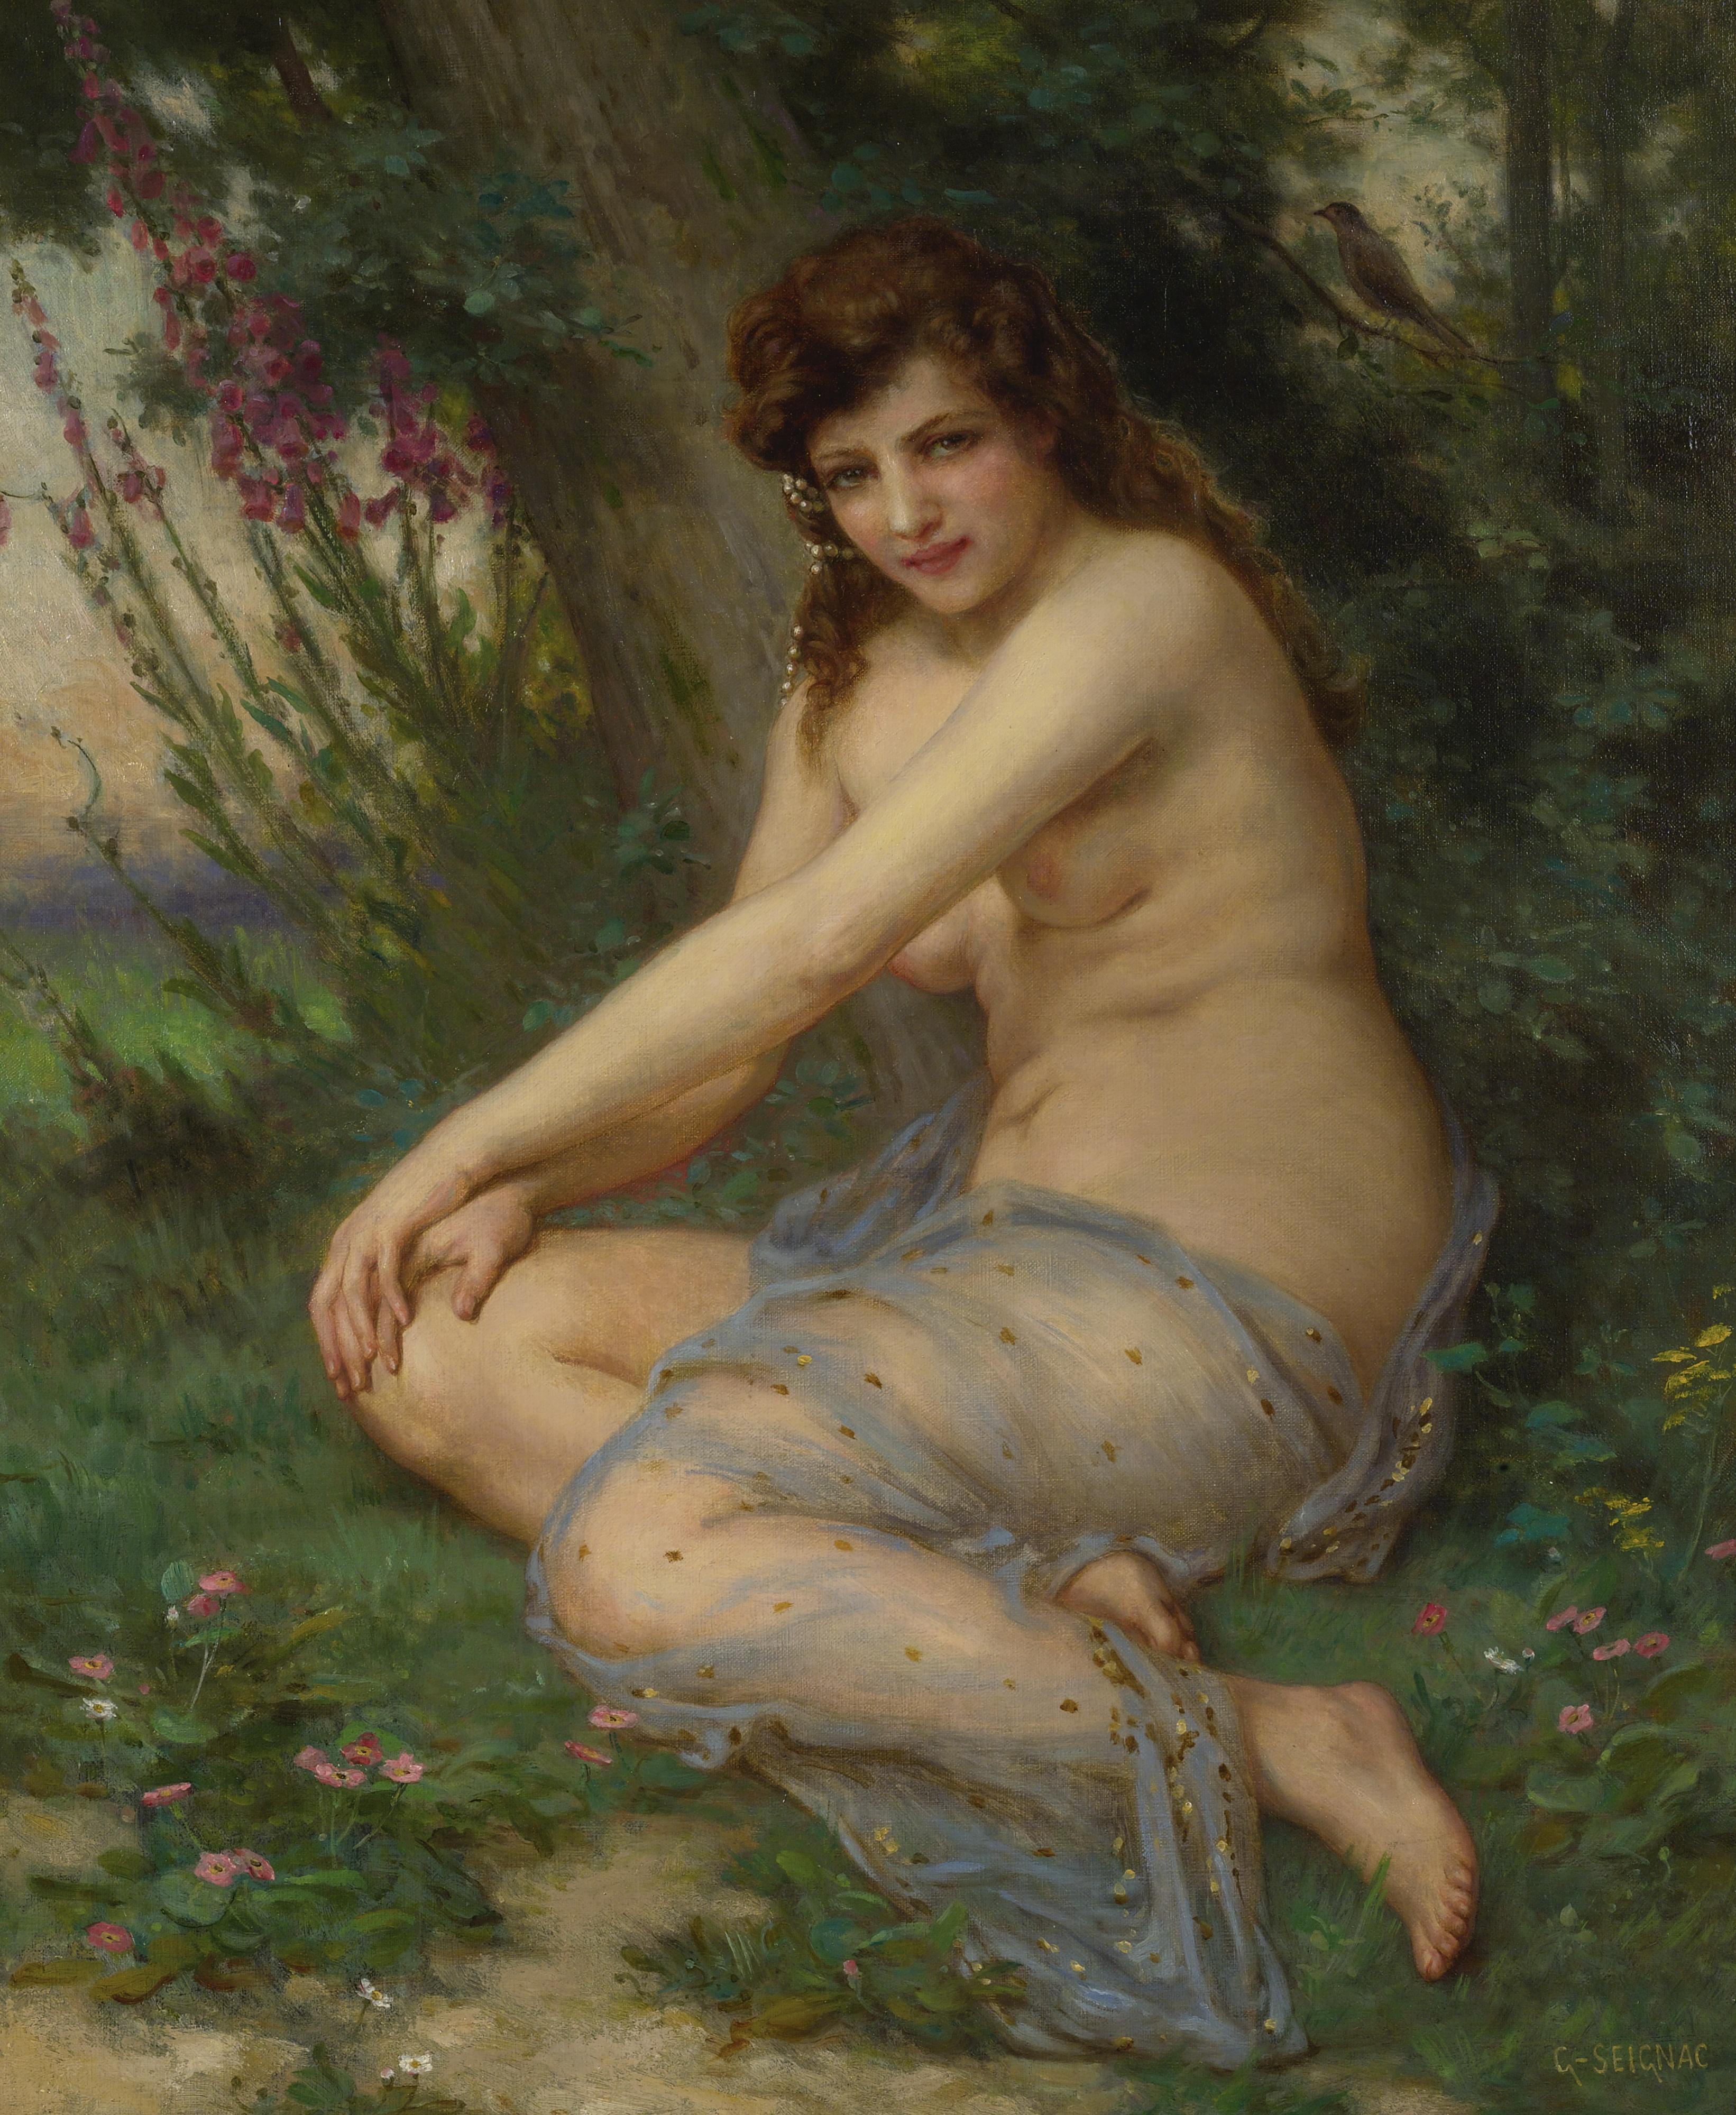 Guillaume Seignac, 1870-1924. В лесу. 64.8 х 54.1 см. Частная коллекция